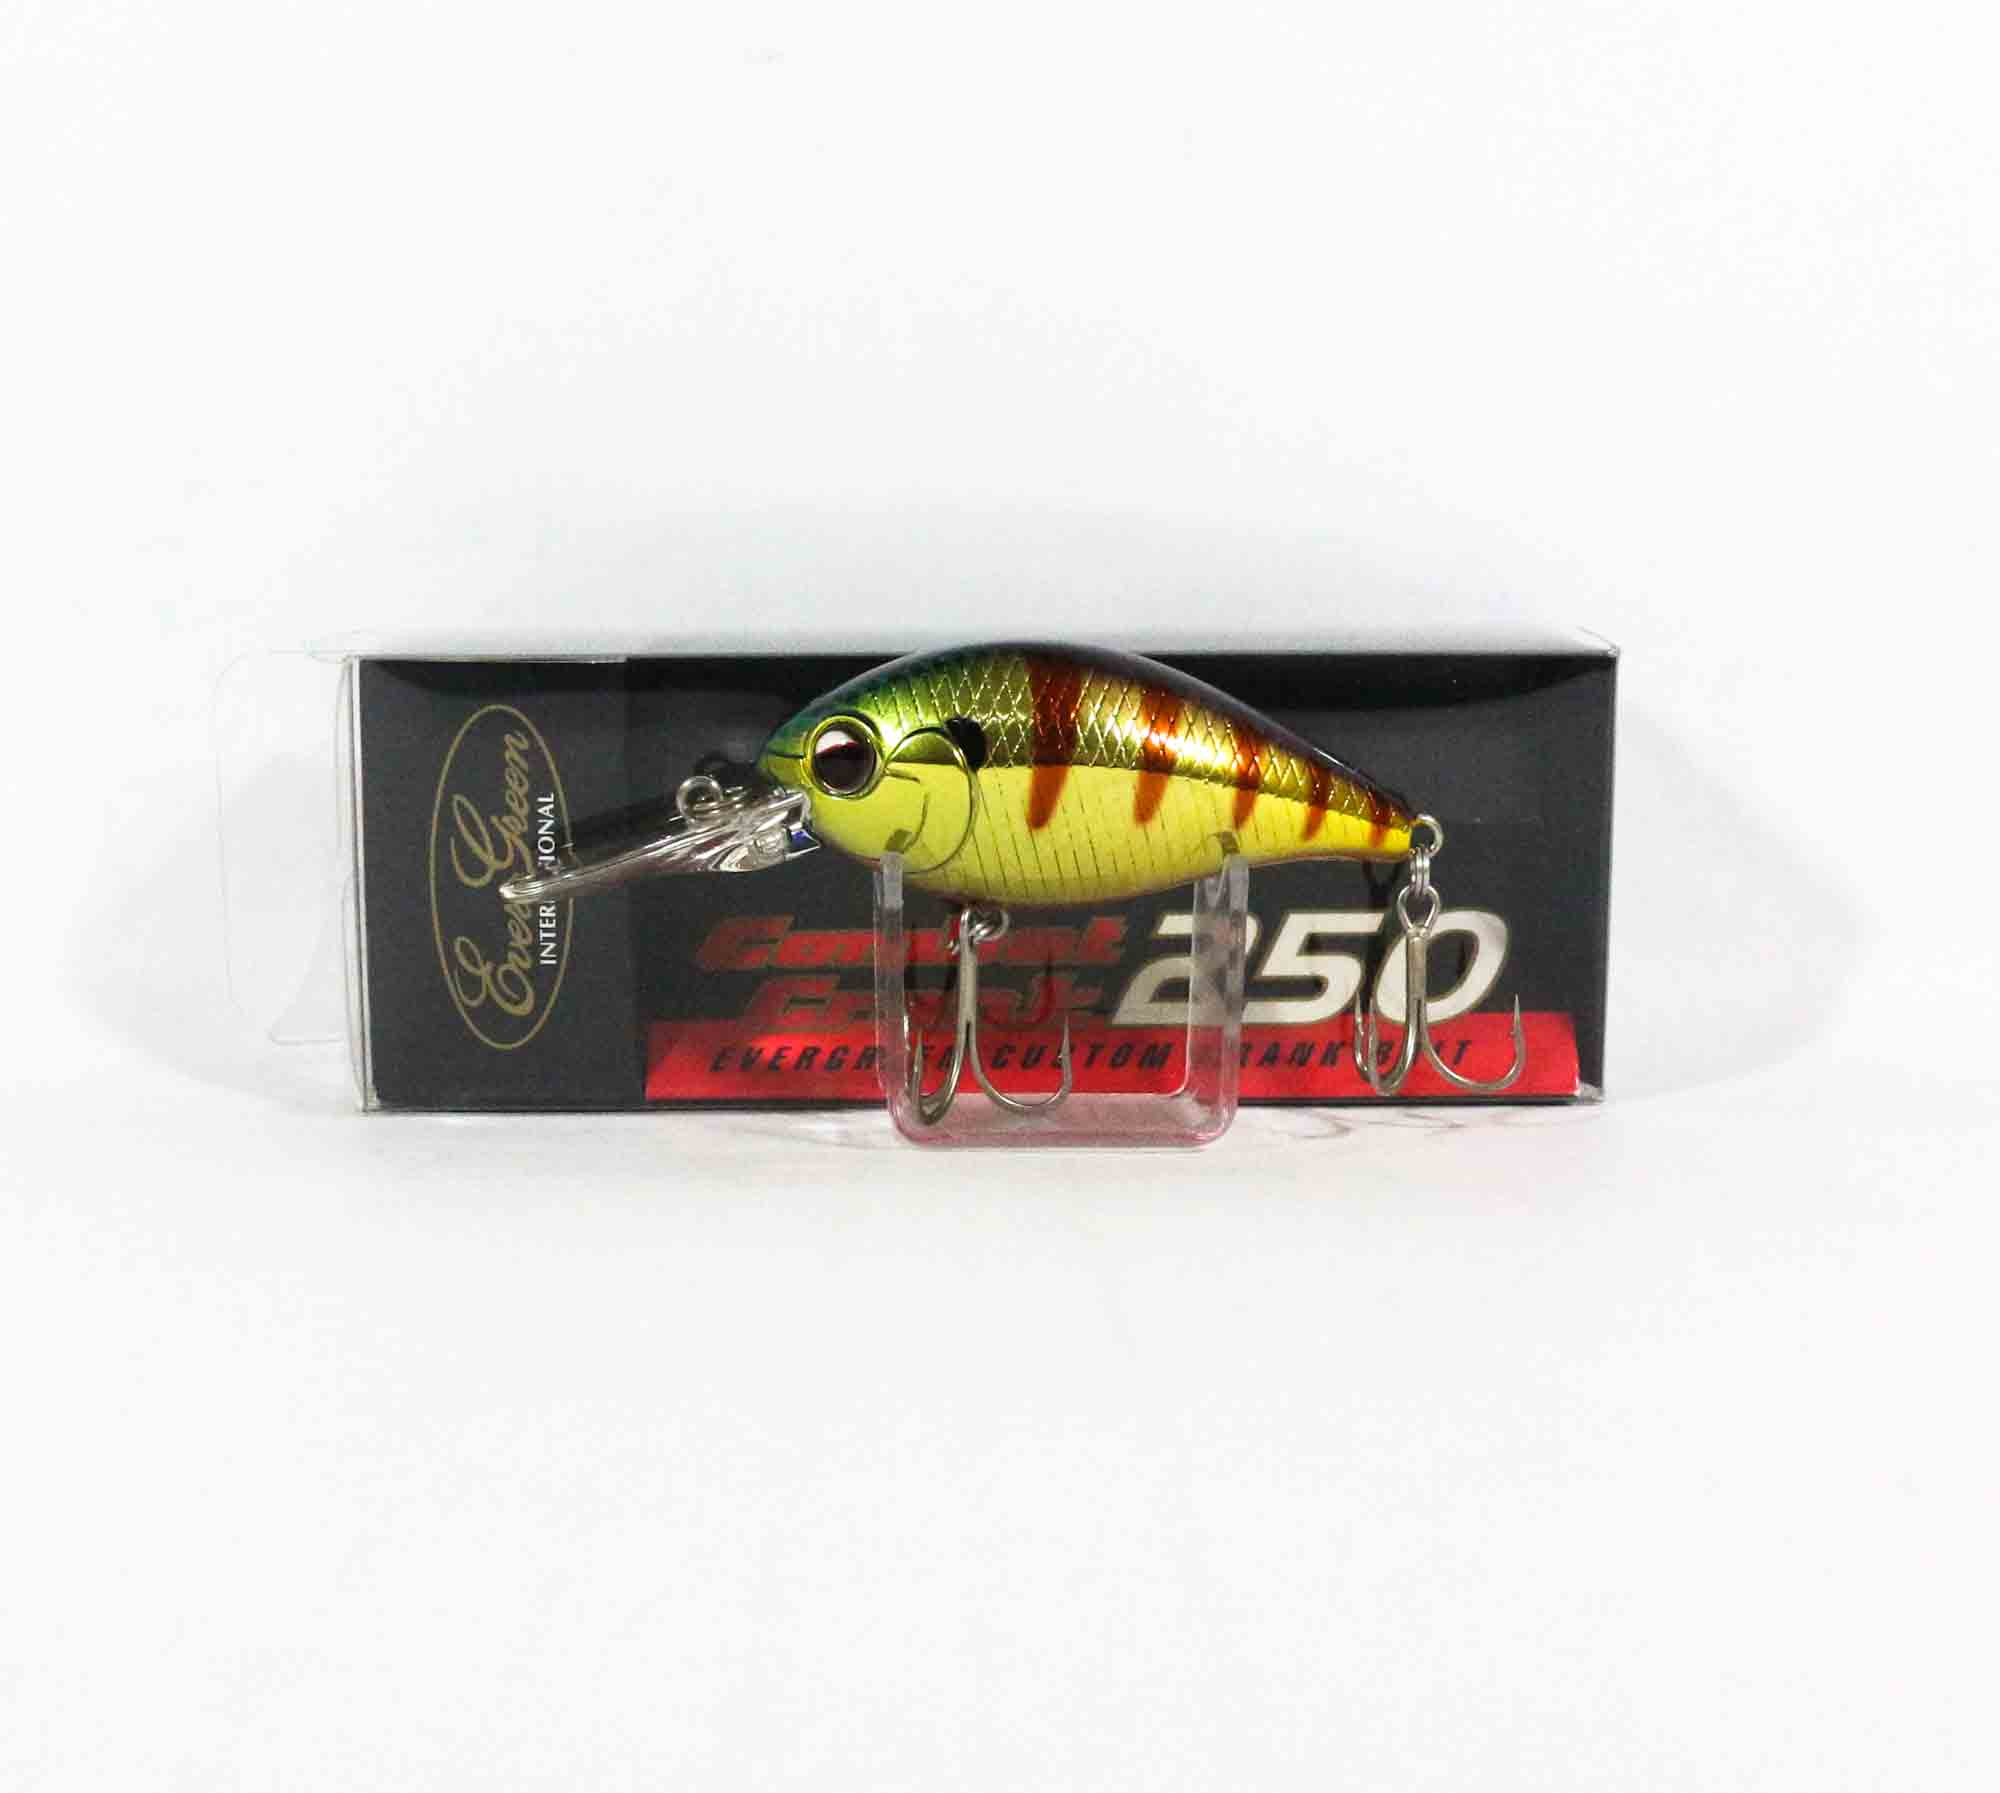 Evergreen Combat Crank 250 Floating Lure 374 (7717)